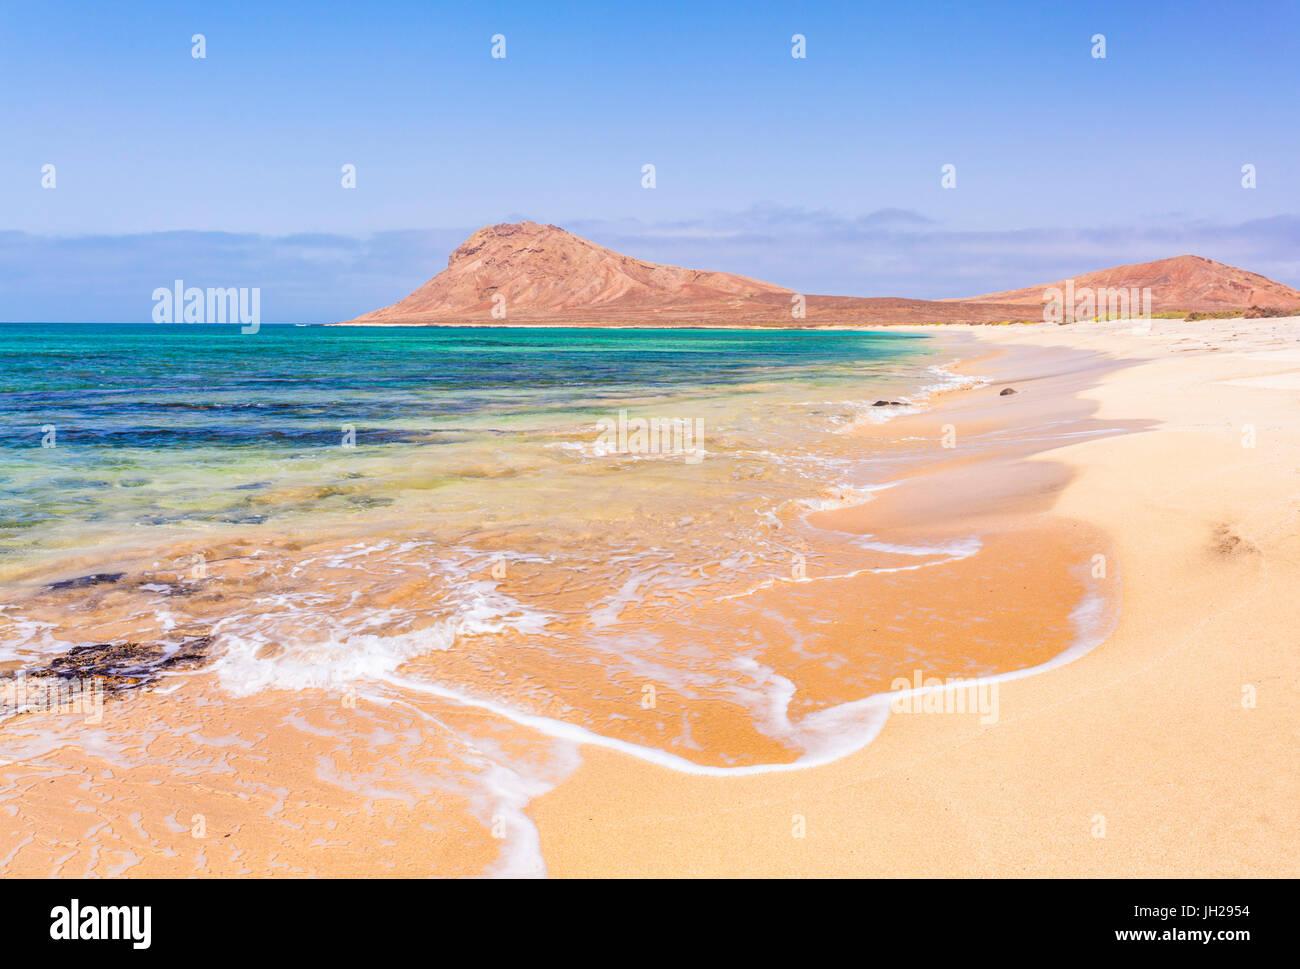 Vuoto spiaggia sabbiosa e baia vicino a Monte Leao mountain (Sleeping Lion montagna), Isola di Sal, Capo Verde, Immagini Stock